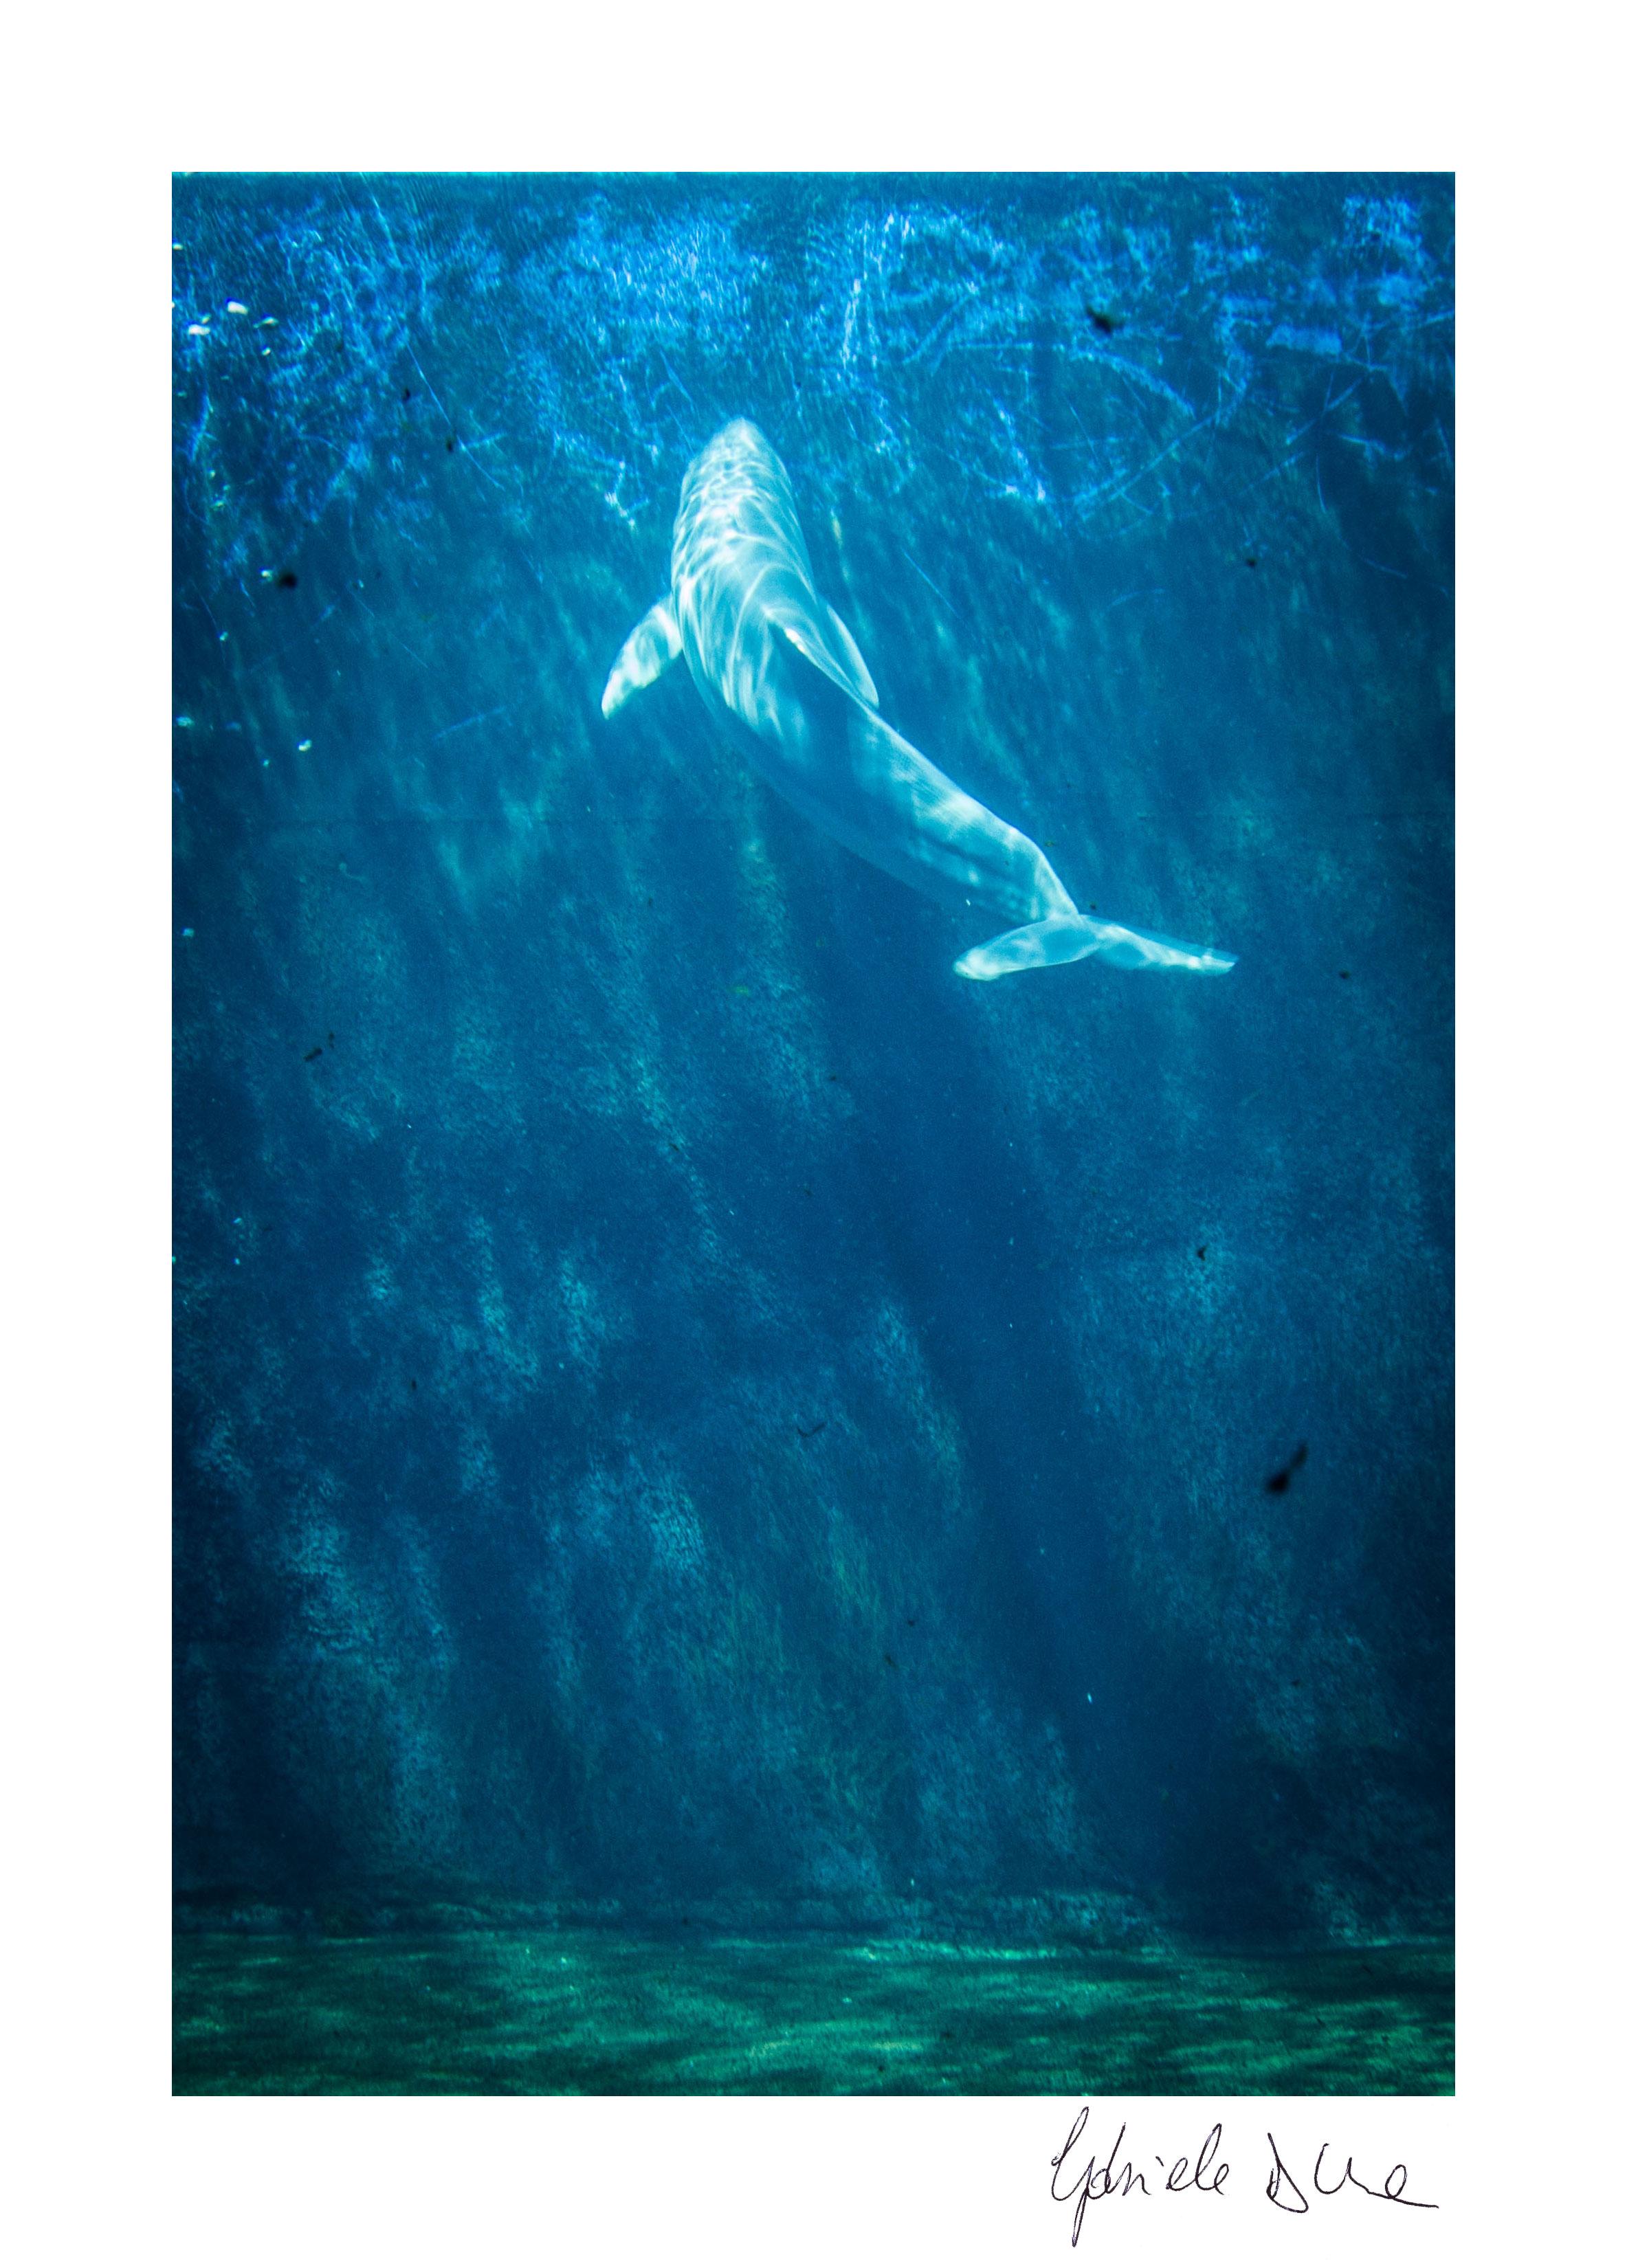 Gabriele D'Uva  - Dolphin (2015)